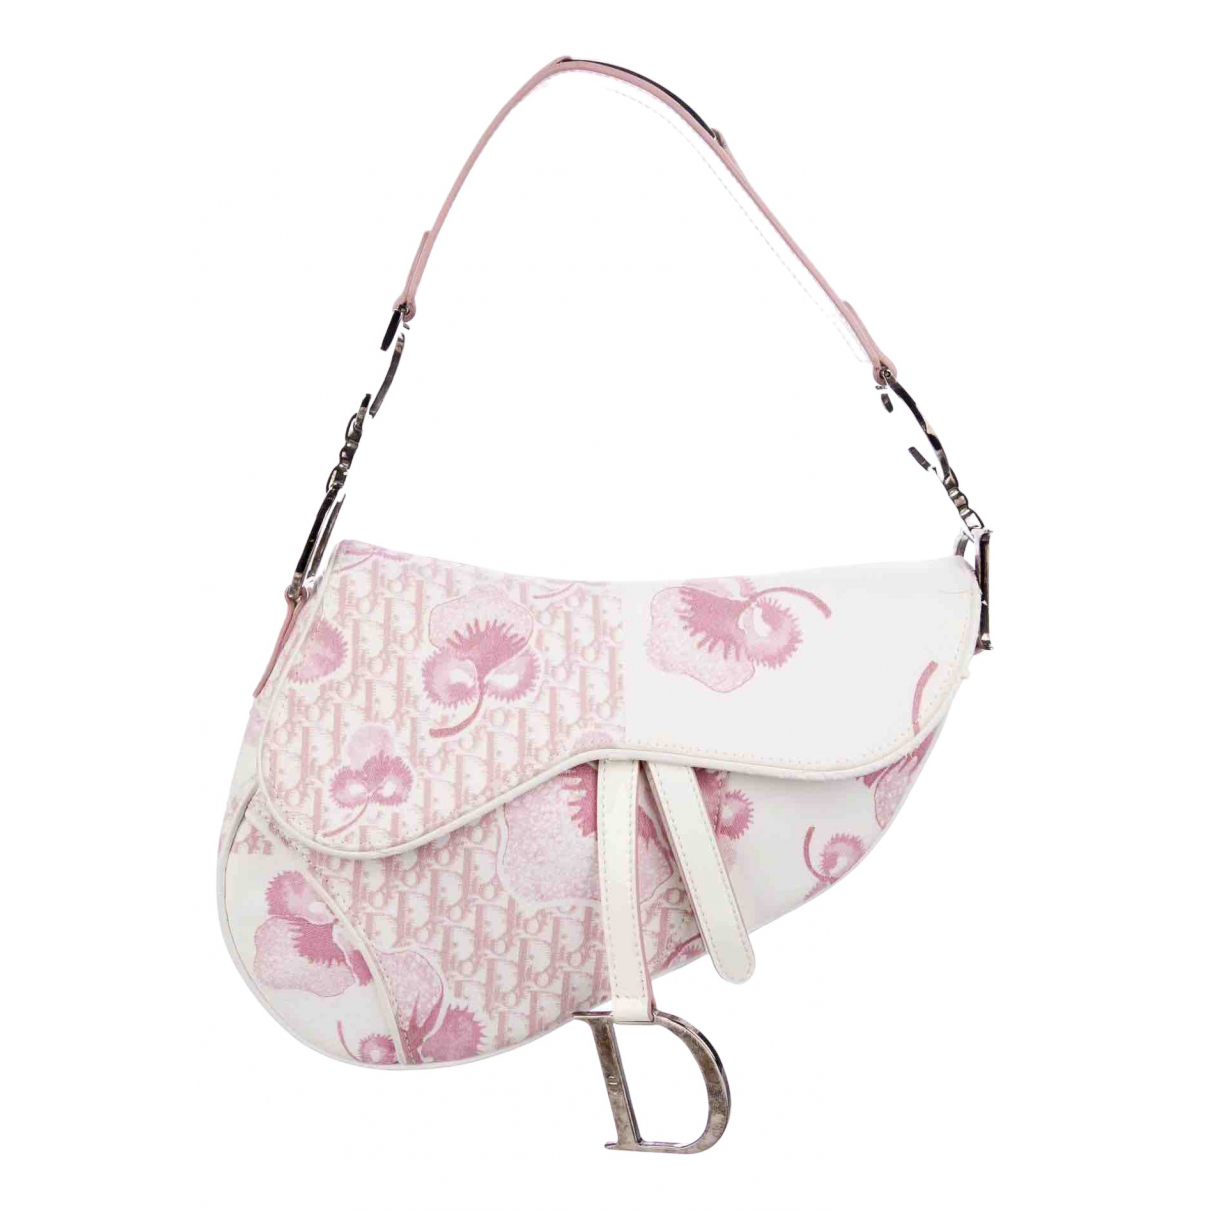 Dior - Sac a main Saddle pour femme en cuir verni - rose